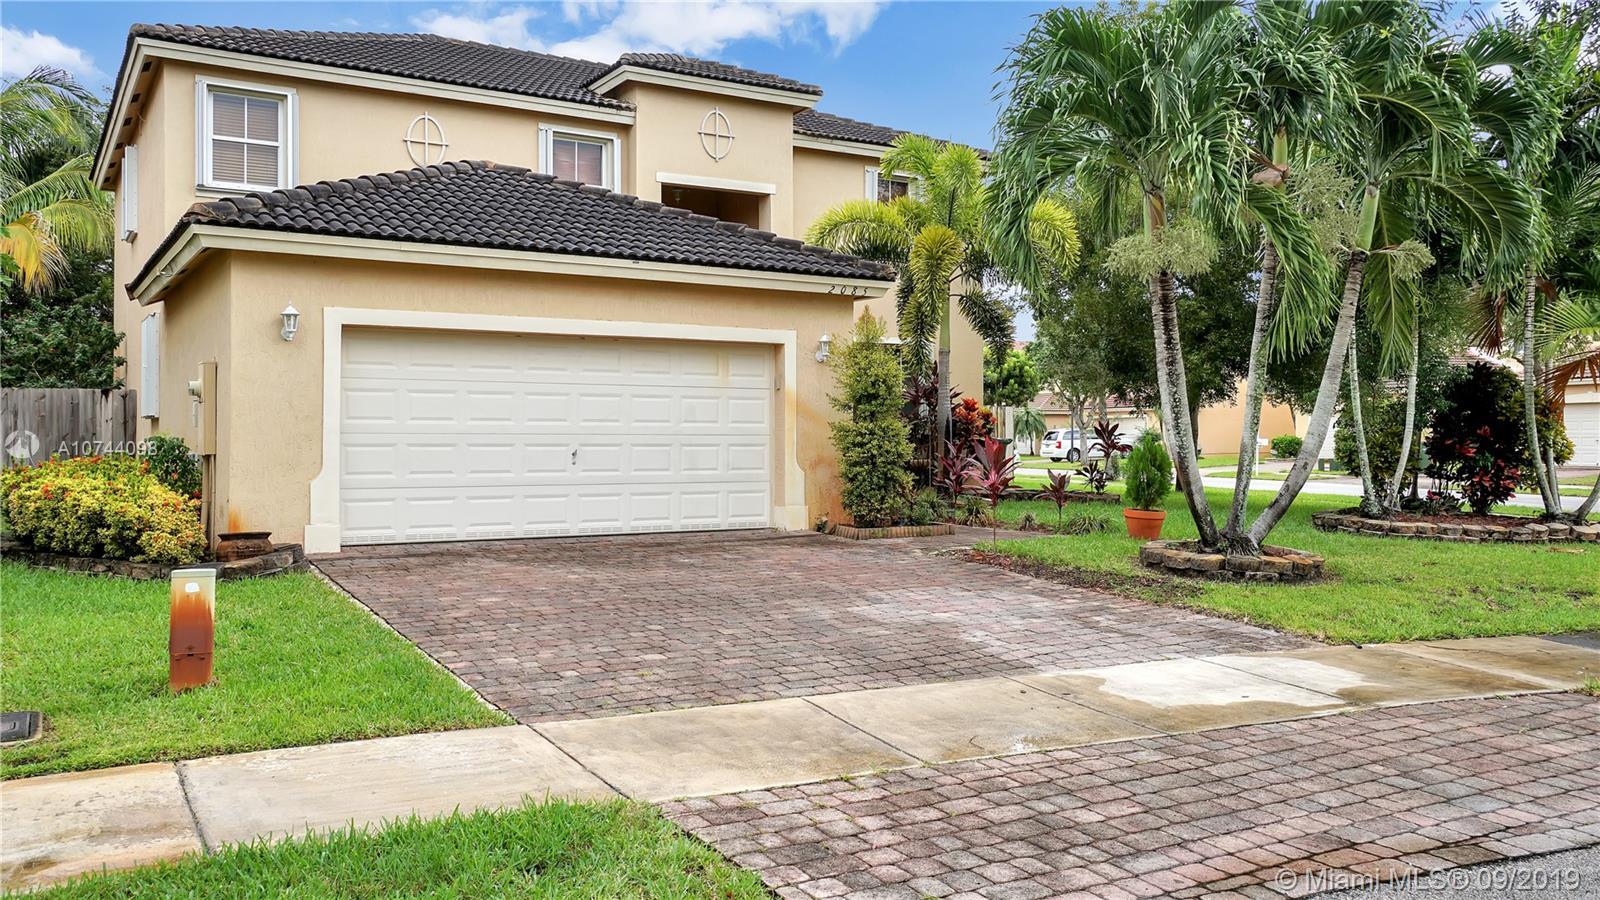 2085 SE 17th Ct, Homestead, FL 33035 - Homestead, FL real estate listing